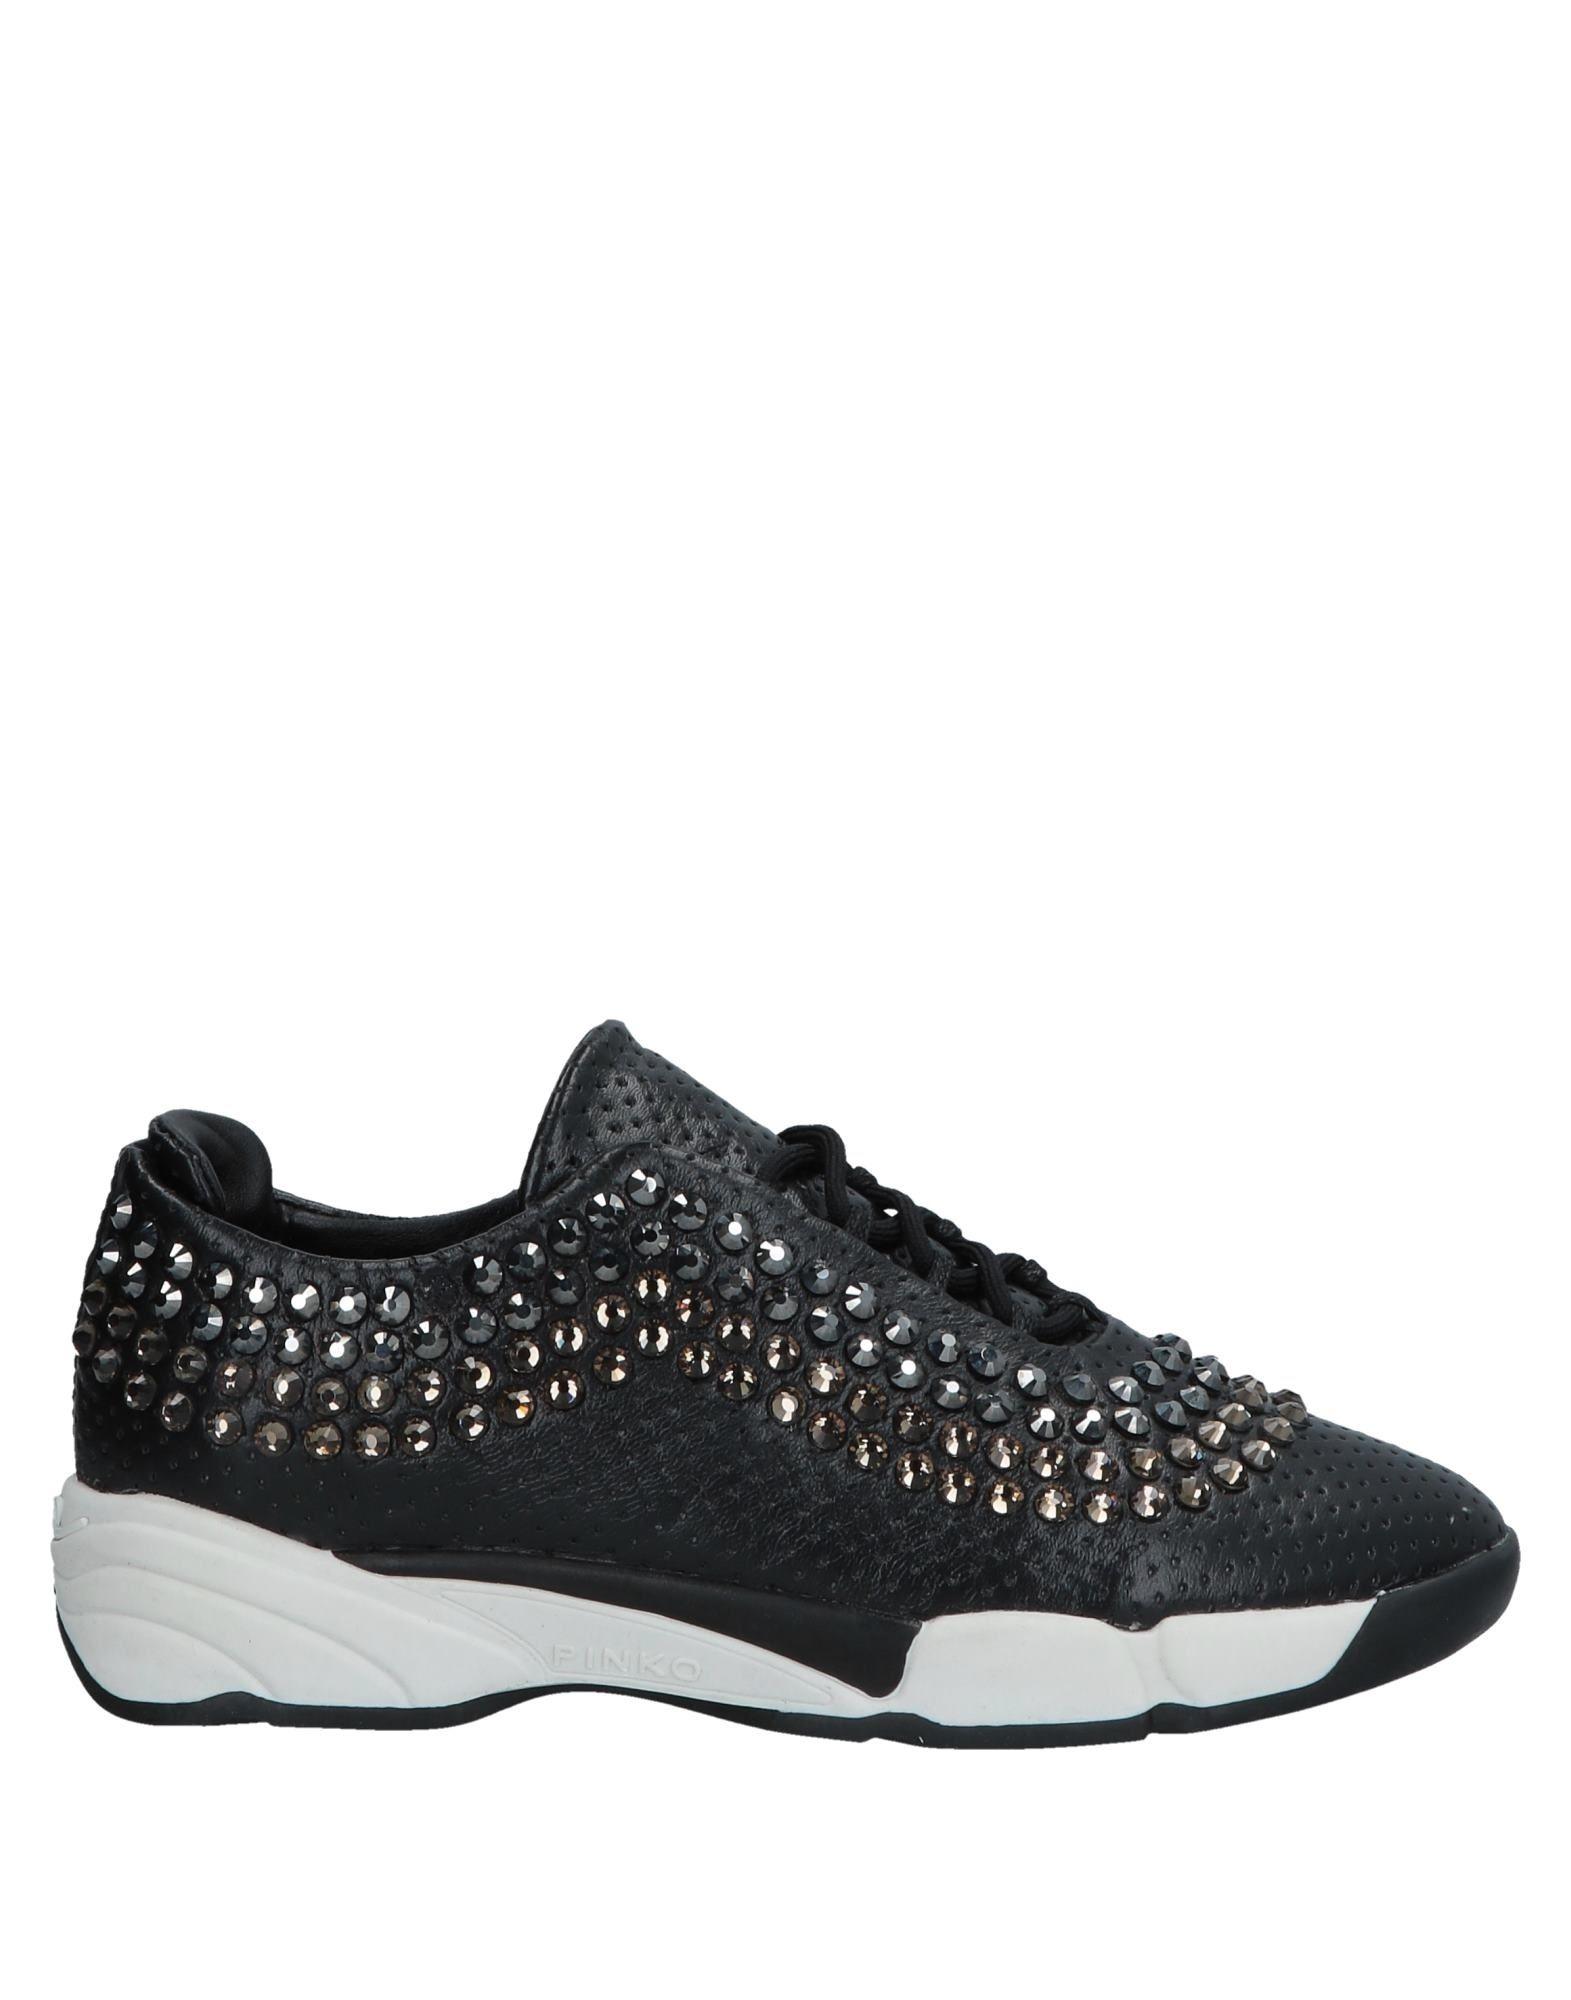 Stilvolle billige Schuhe Pinko Sneakers 11571929SU Damen  11571929SU Sneakers 95f315